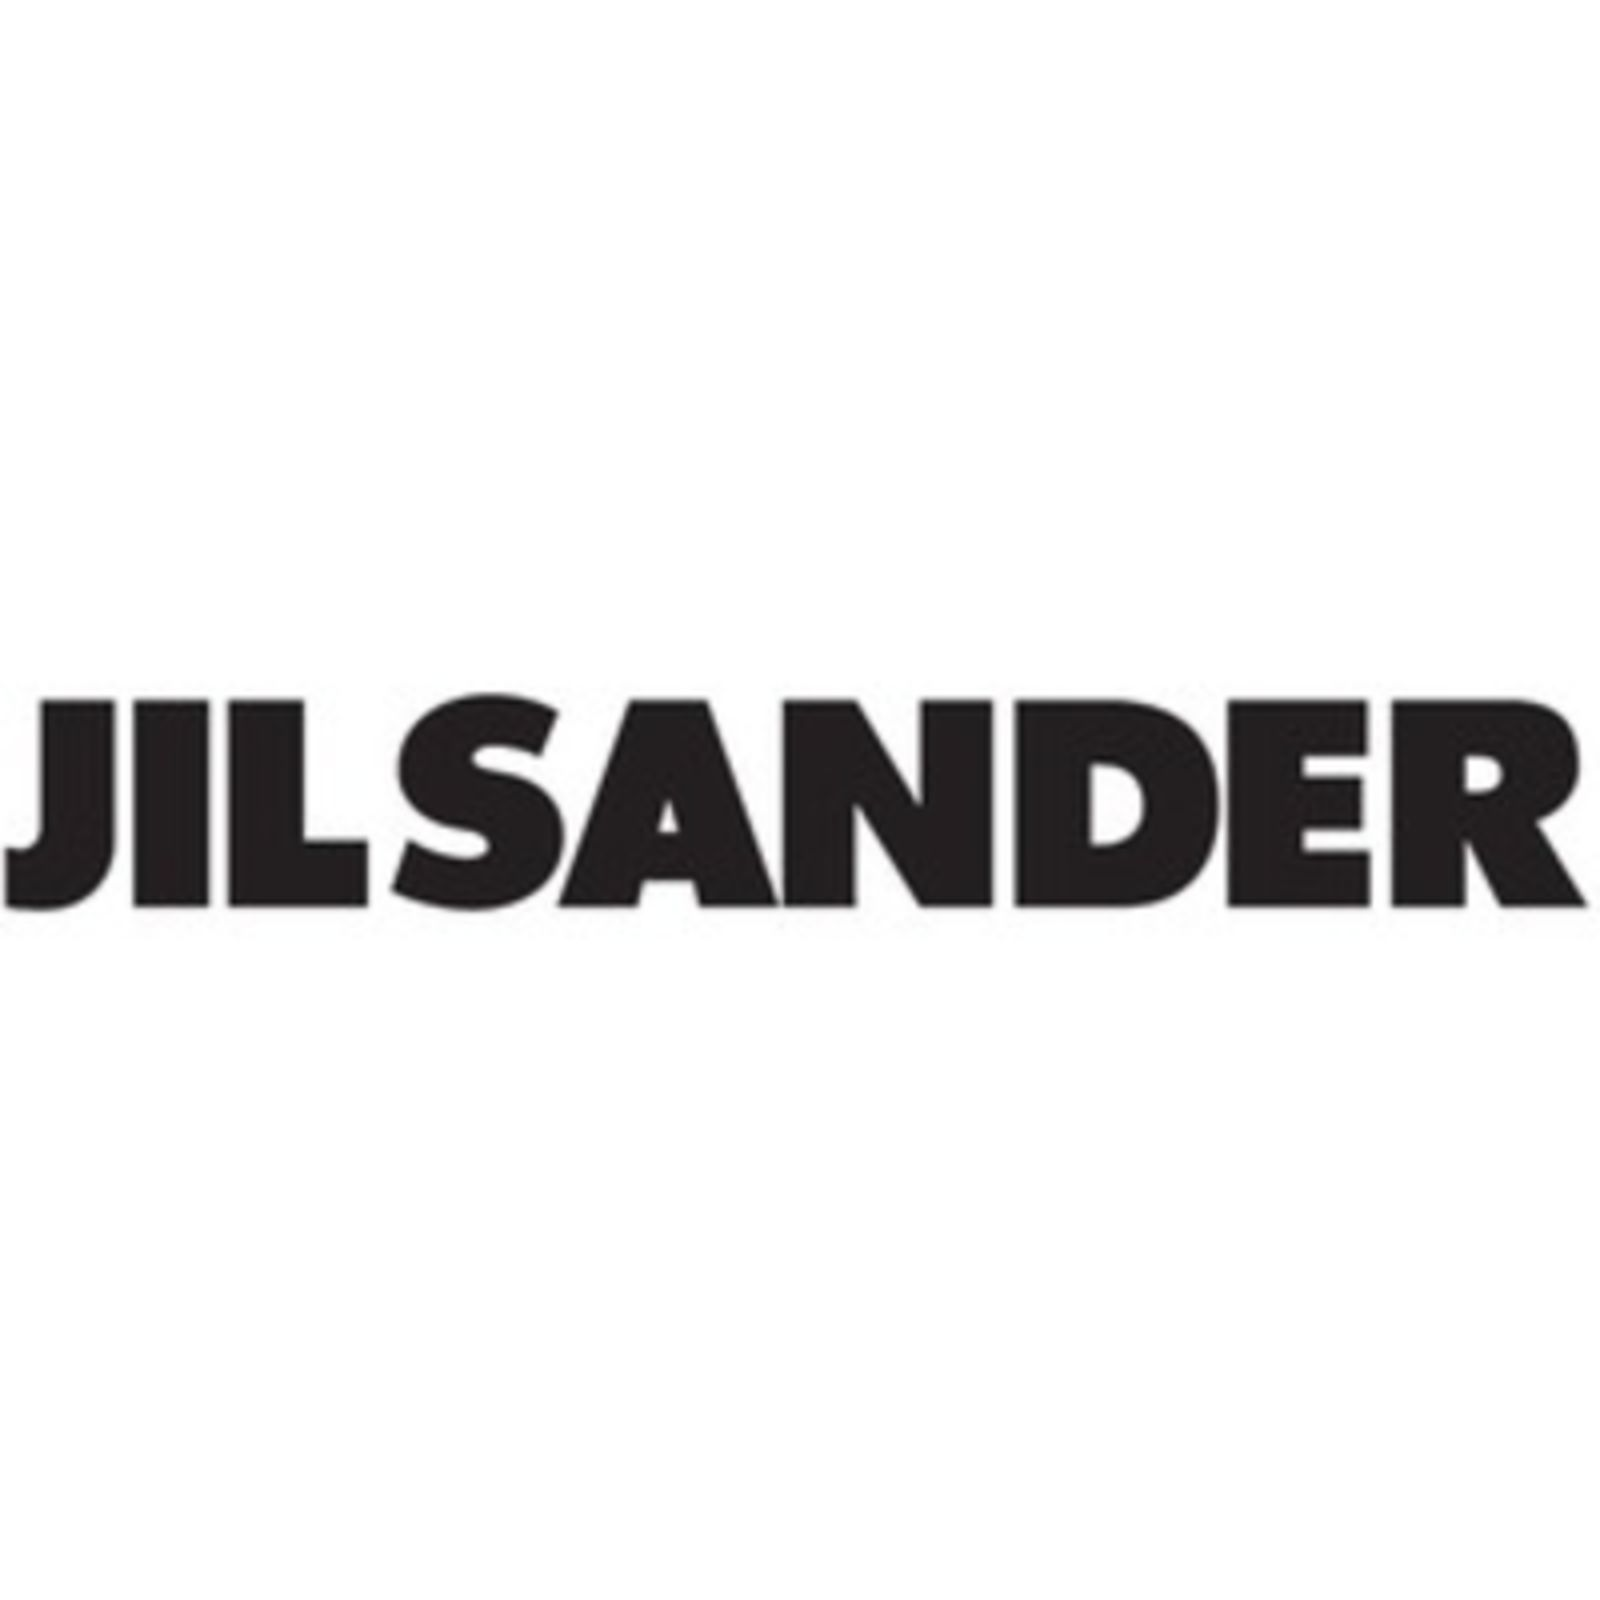 JIL SANDER (Bild 1)